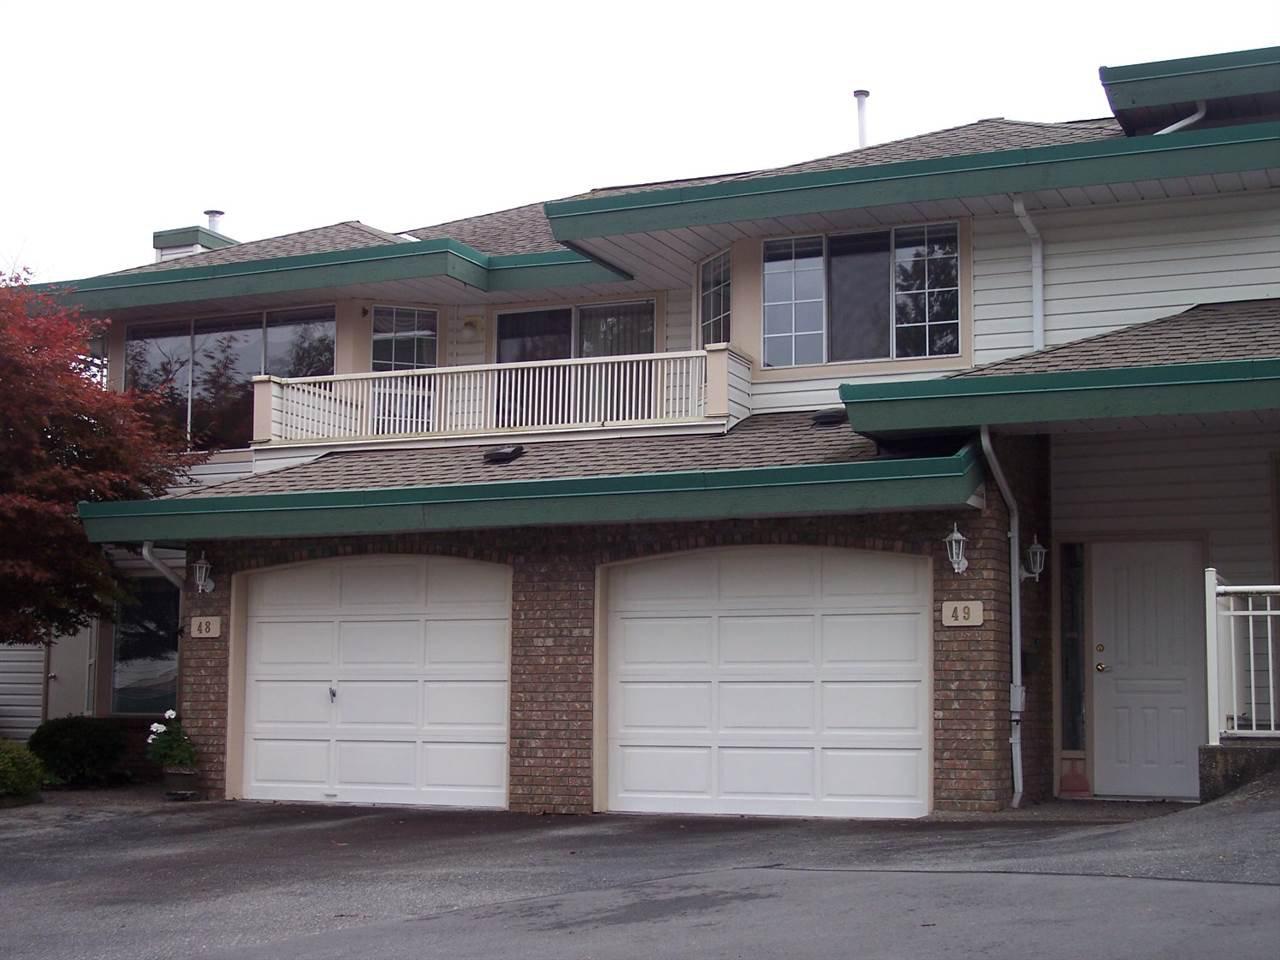 "Main Photo: 49 3115 TRAFALGAR Street in Abbotsford: Central Abbotsford Townhouse for sale in ""CEDARBROOK VILLAGE"" : MLS®# R2007846"